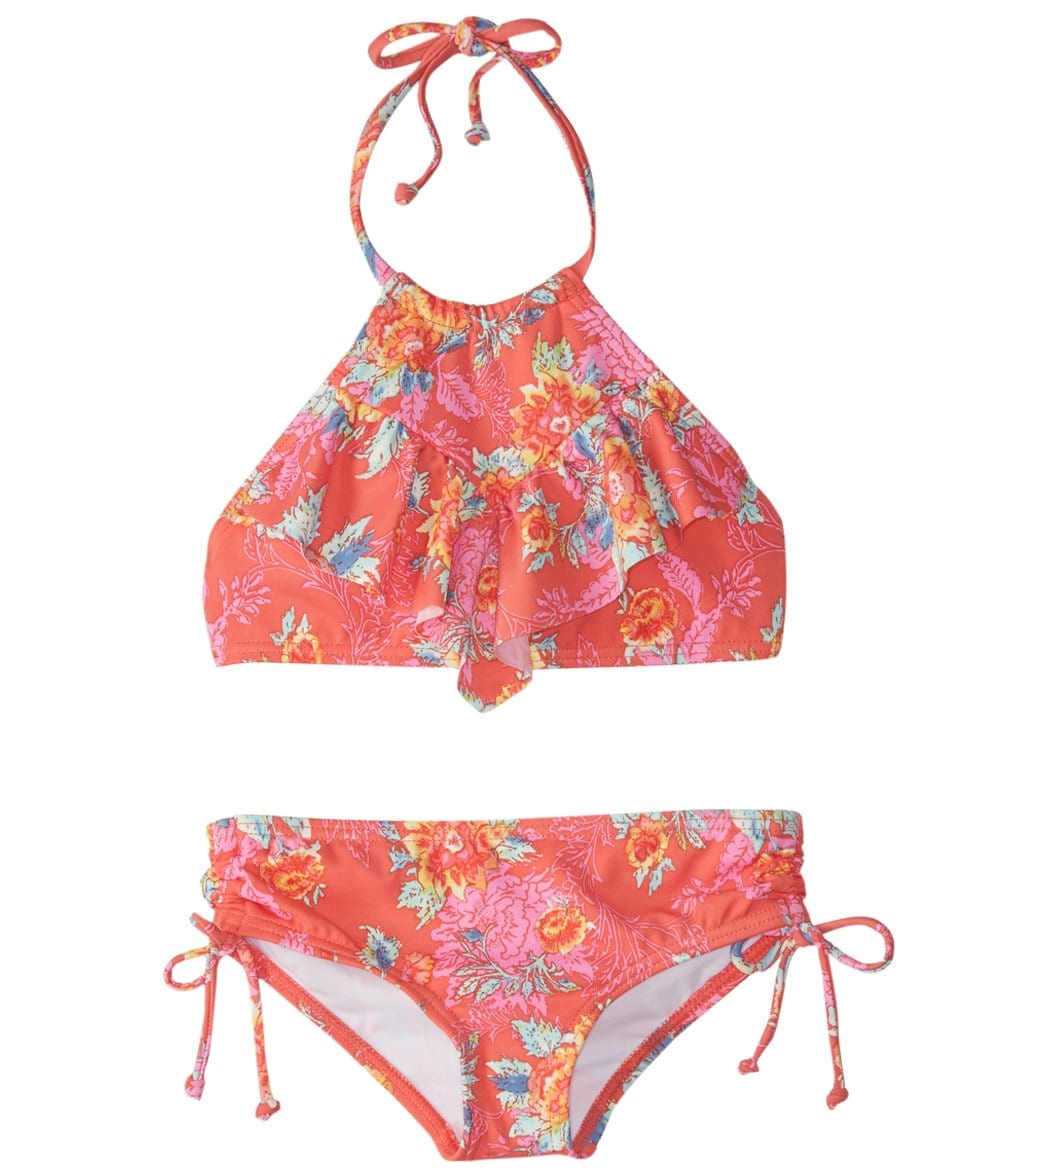 0b9cac95b38c9 Billabong Girls  Rosie Daze High Neck Bikini Set (4-14) at SwimOutlet.com -  Free Shipping